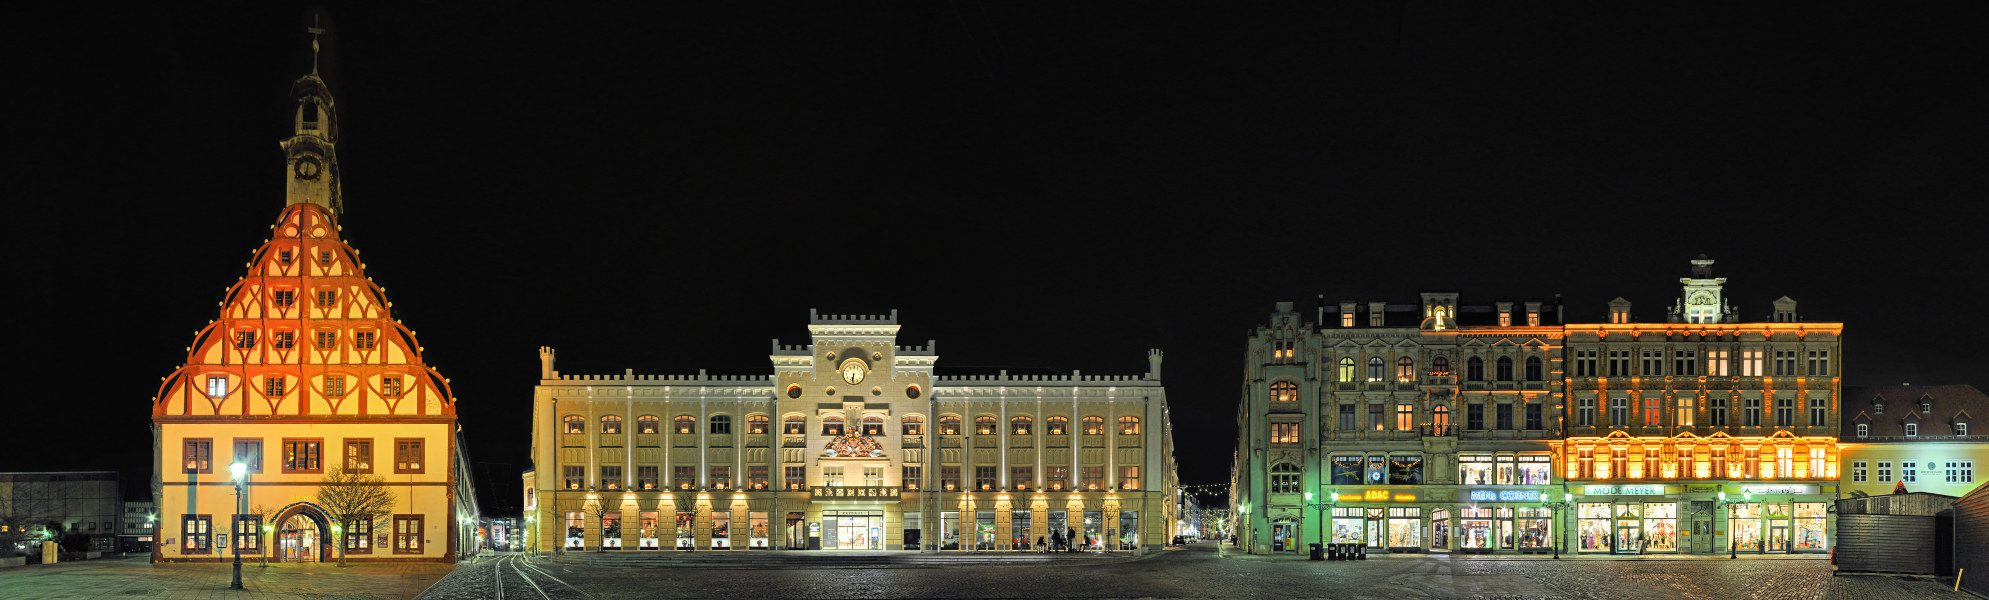 Gewandhaus | Rathaus | Hauptmarkt